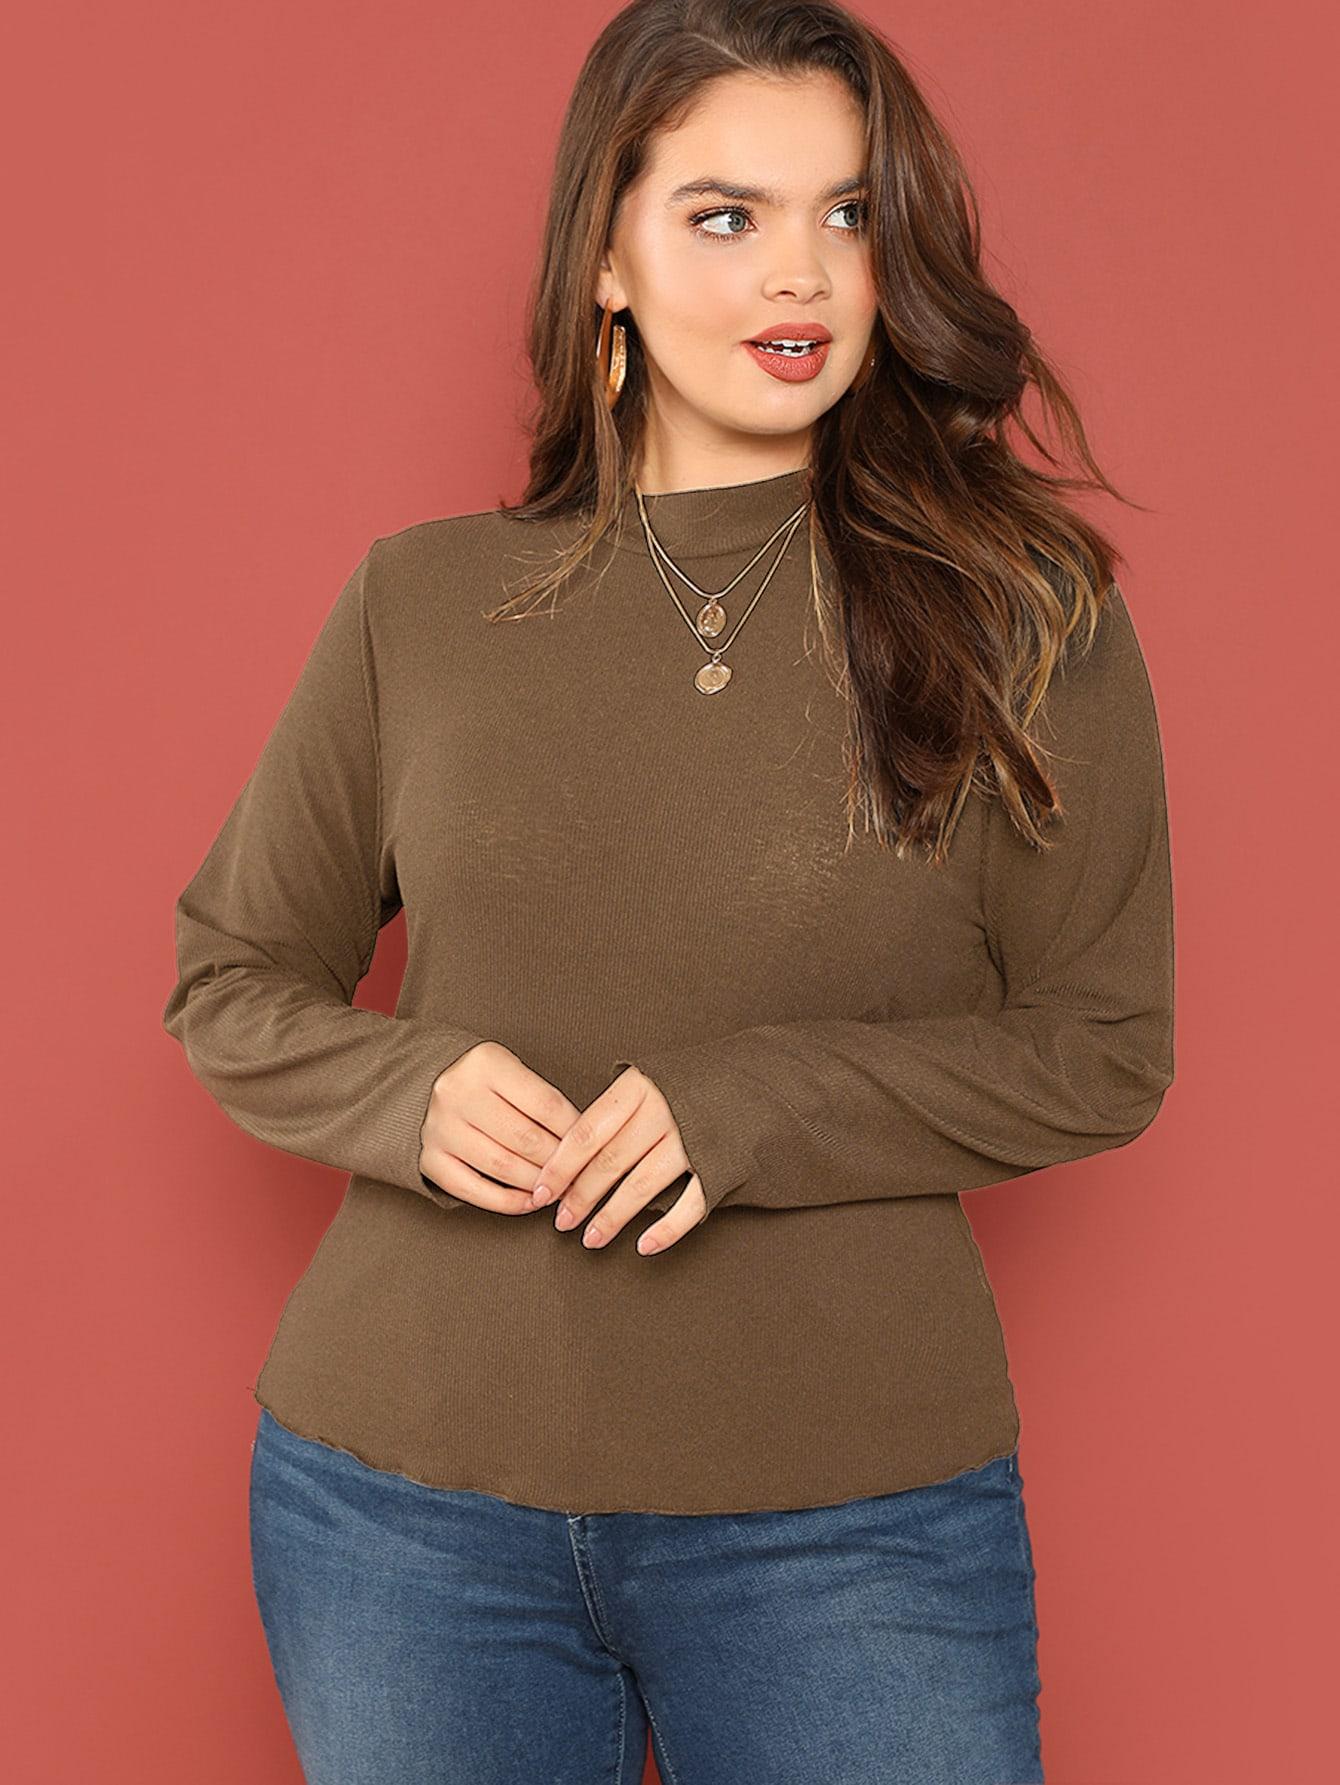 Купить Размера плюс однотонная футболка со стоячим воротником, Faith Bowman, SheIn